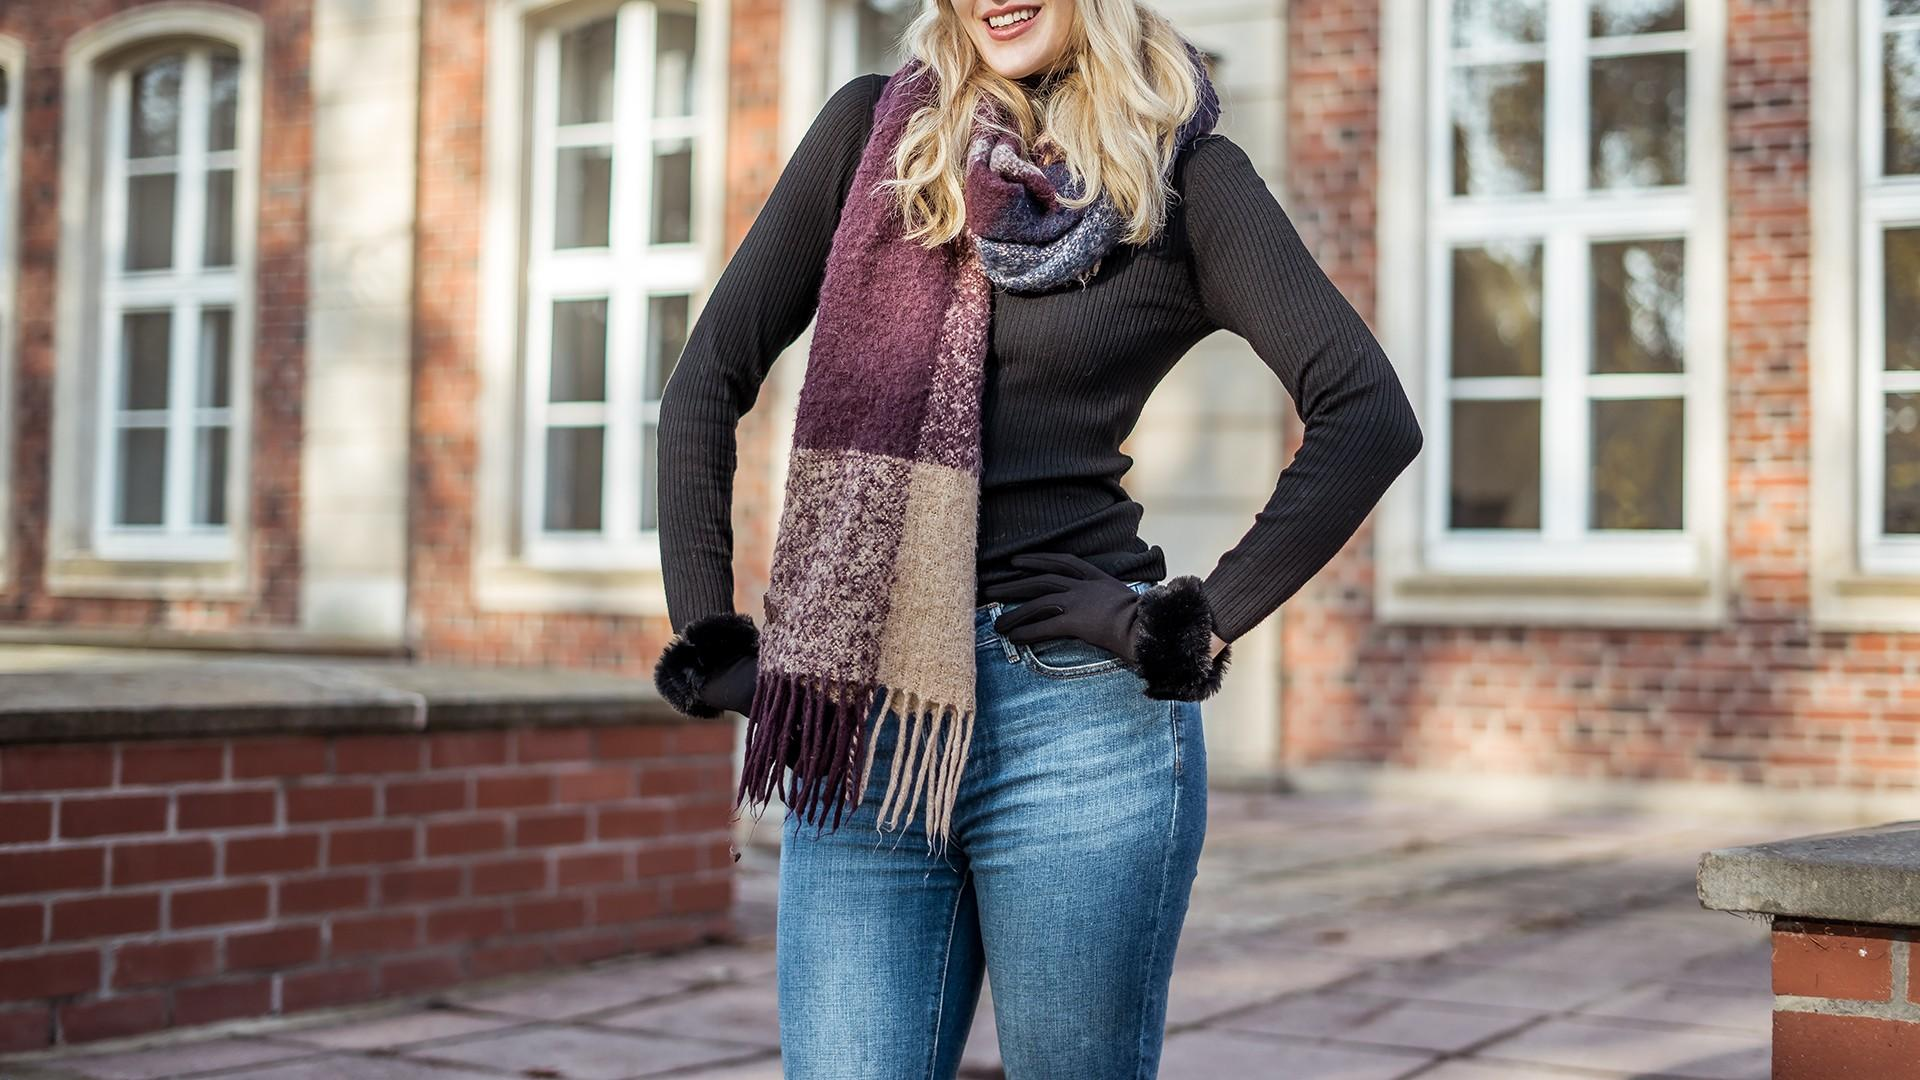 Christina from Kay Escorts